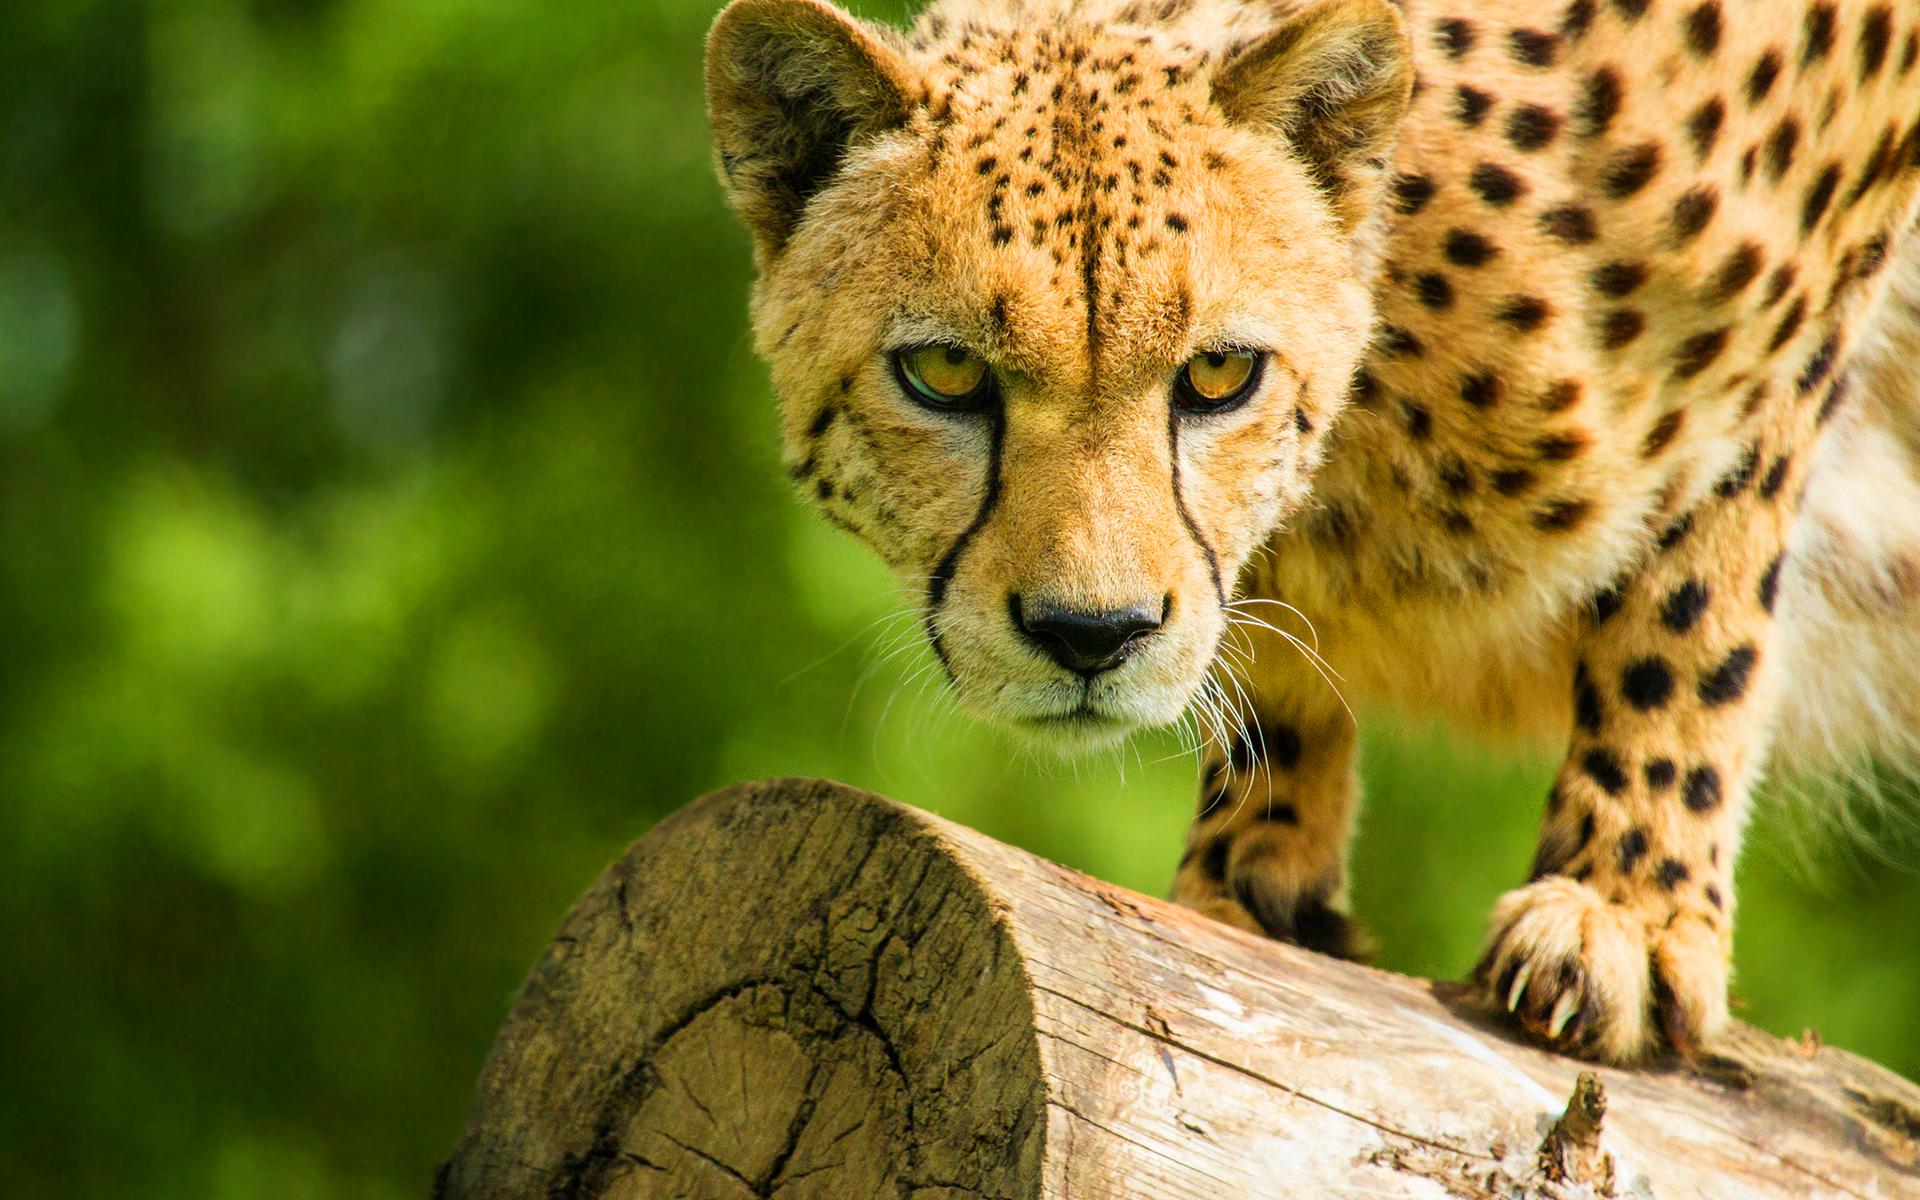 cheetah wild cat hd desktop wallpapers 4k hd